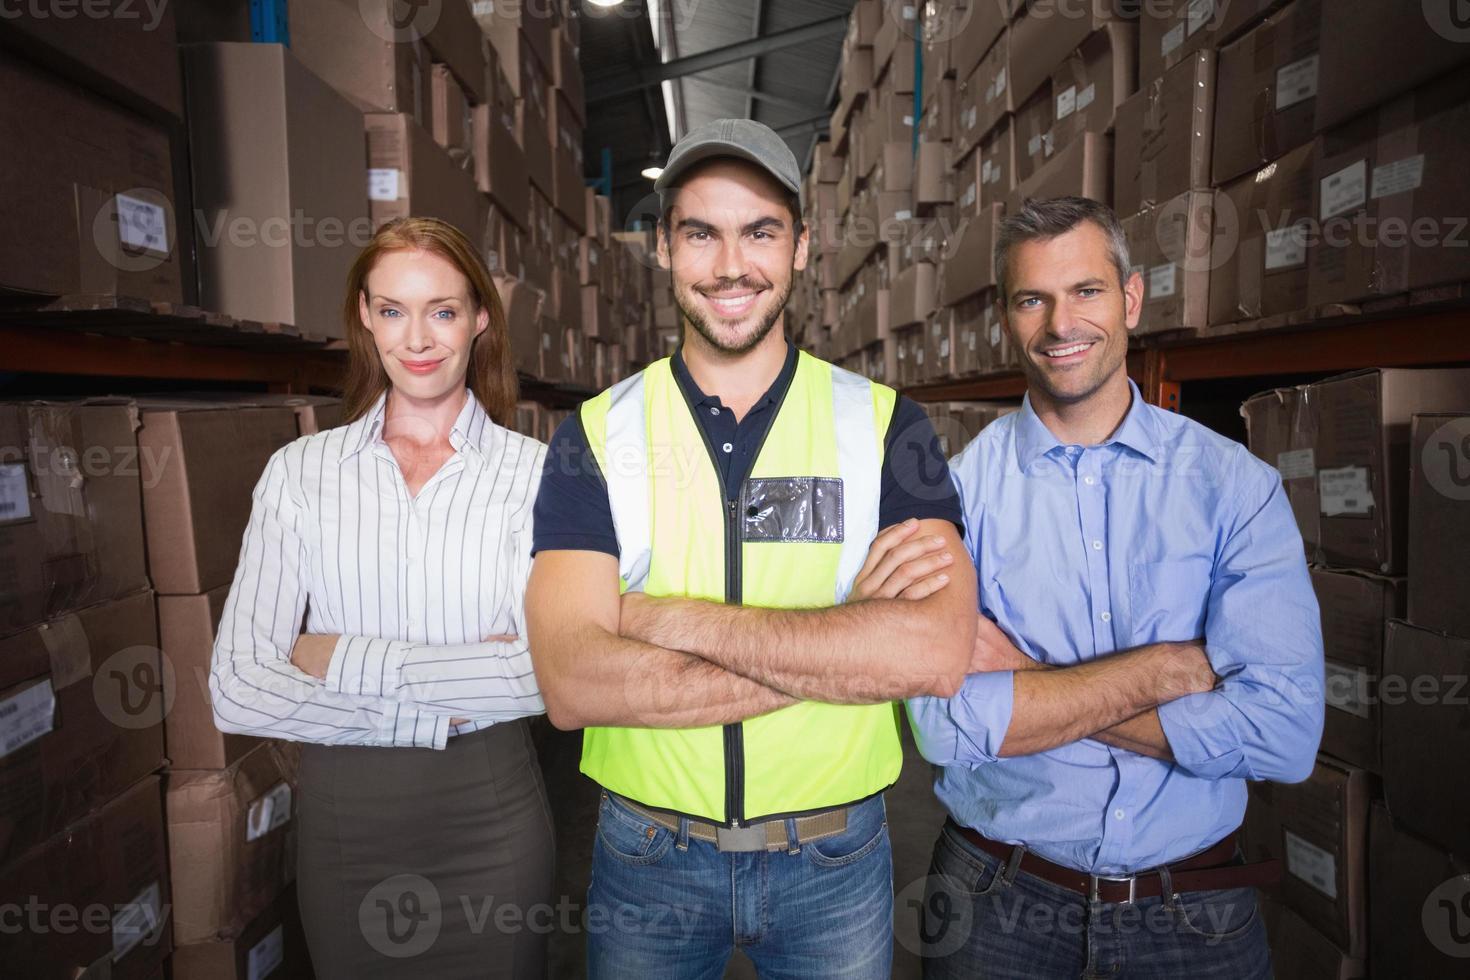 Warehouse team smiling at camera showing thumbs up photo